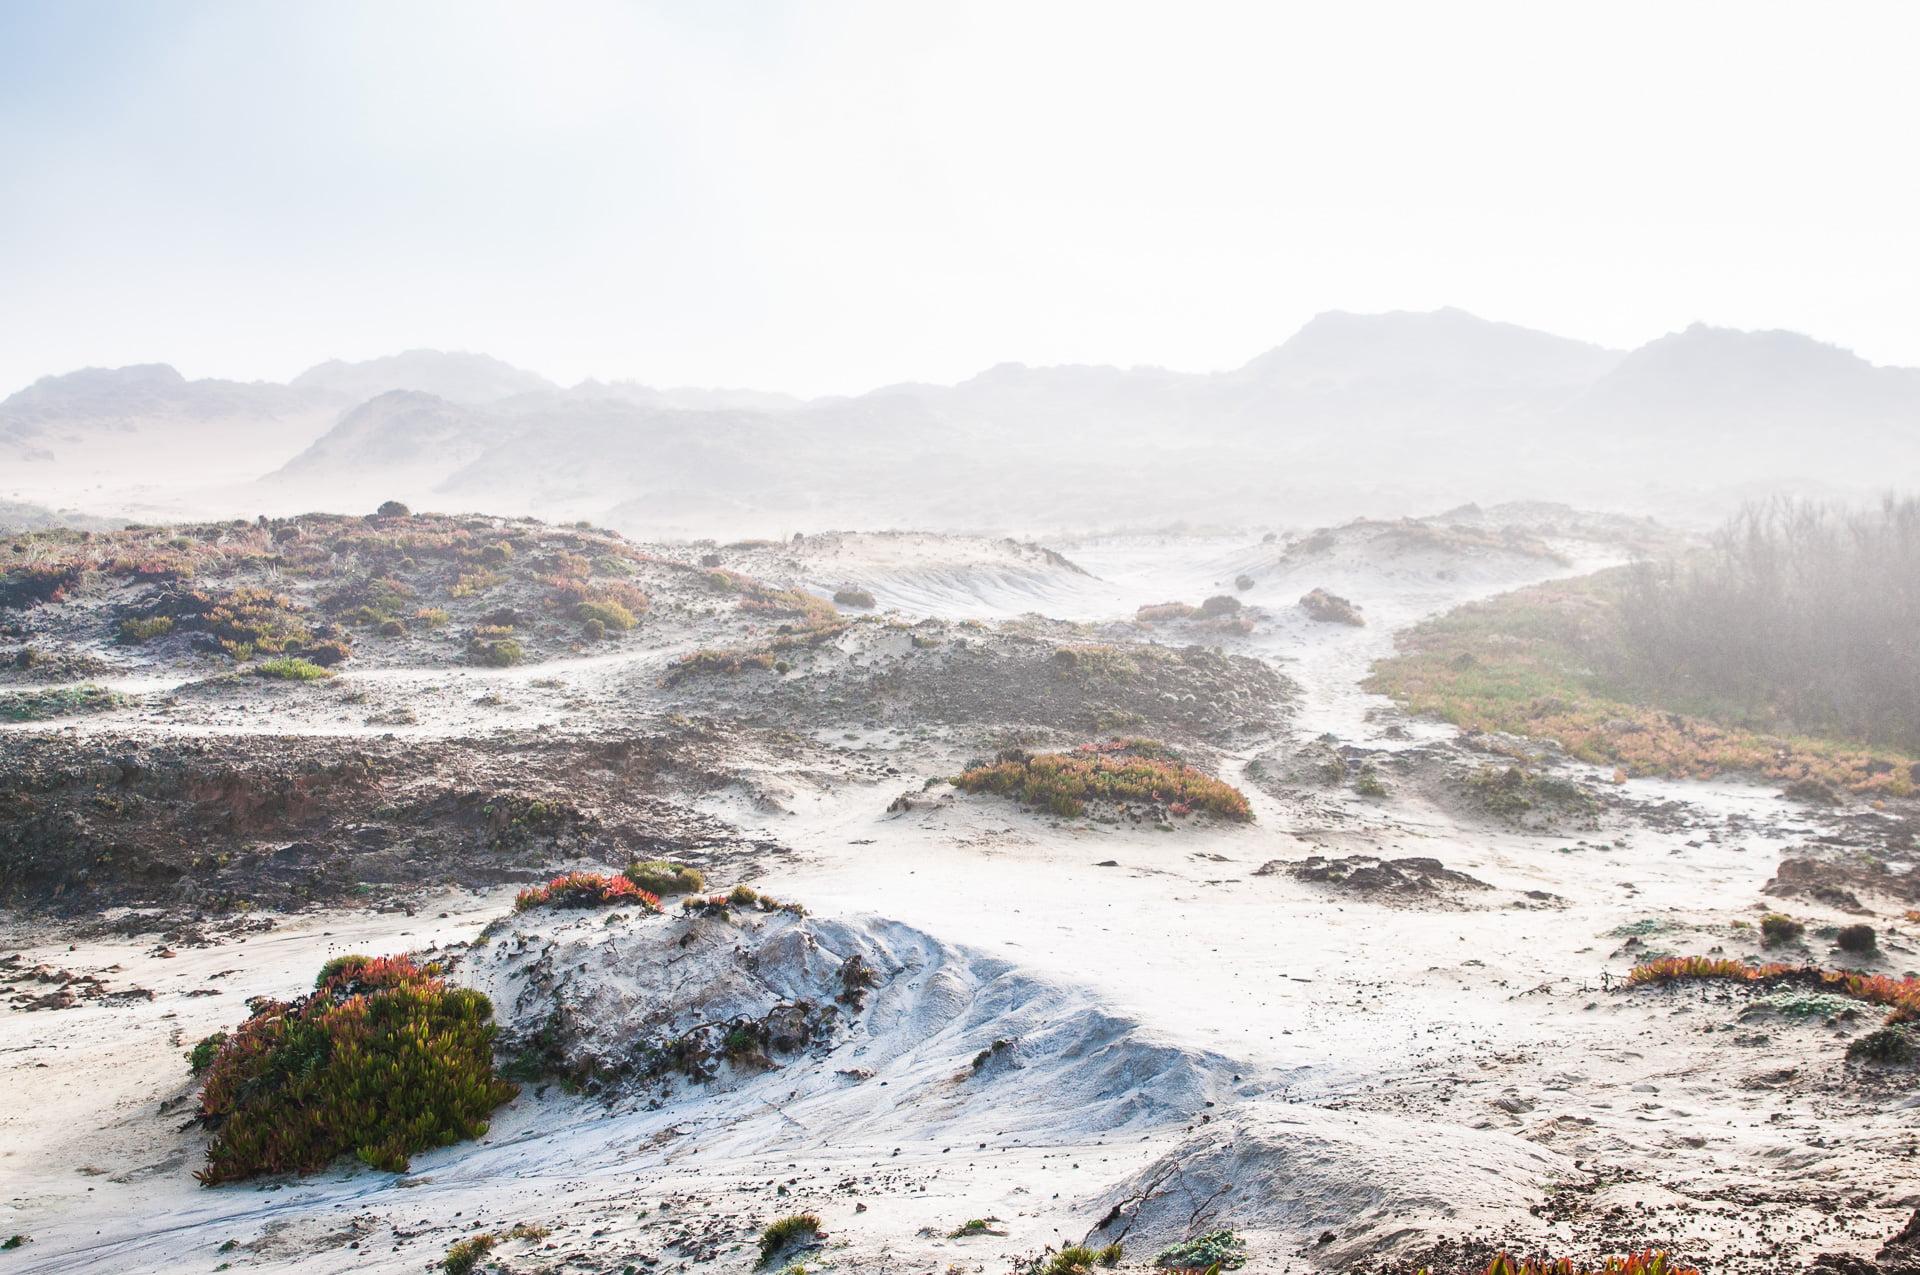 almogarve dunes dans la brume 2